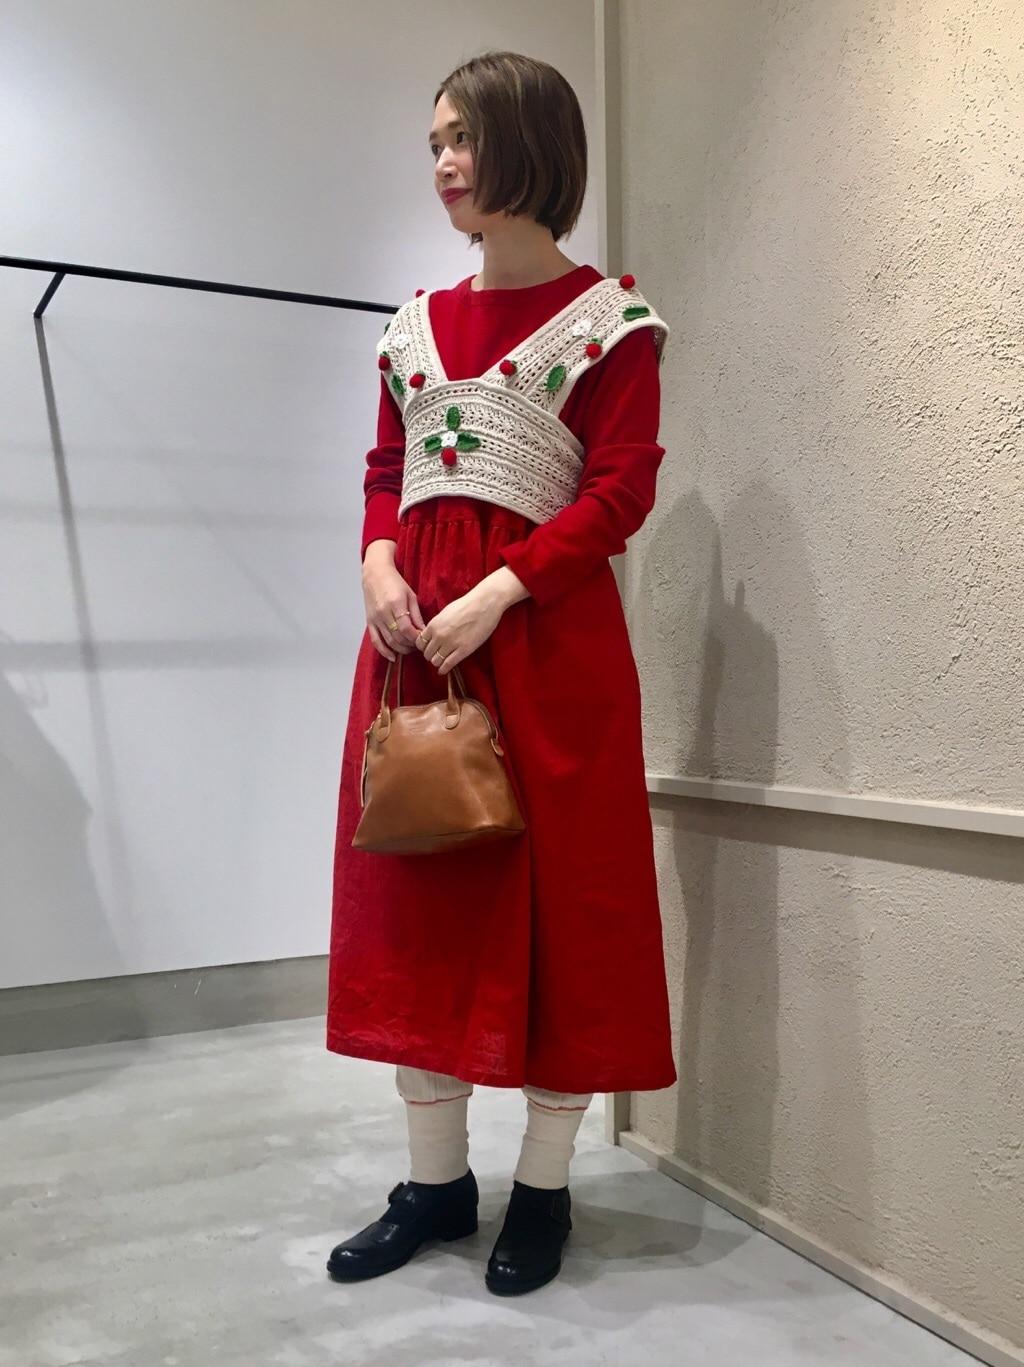 chambre de charme 横浜ジョイナス 身長:160cm 2021.01.07